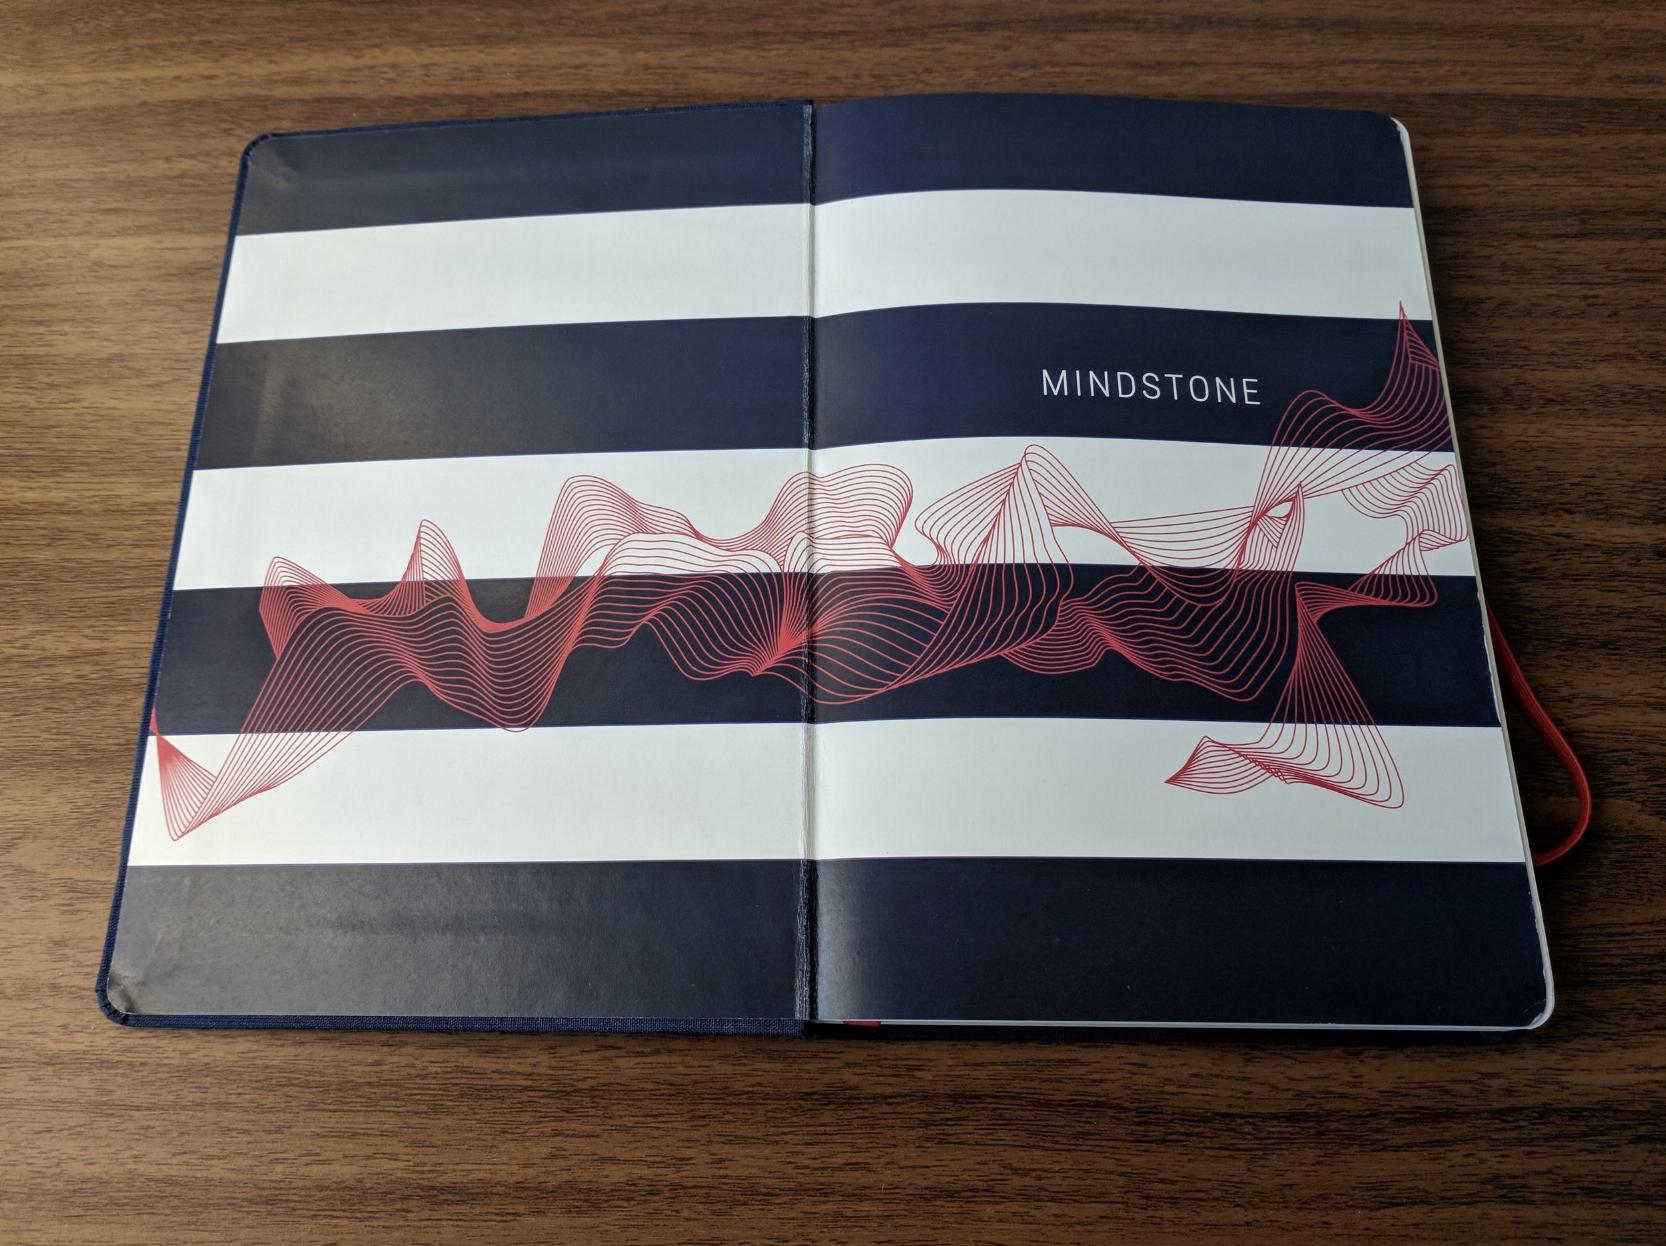 Mindstone-Notebook-Inside-Cover